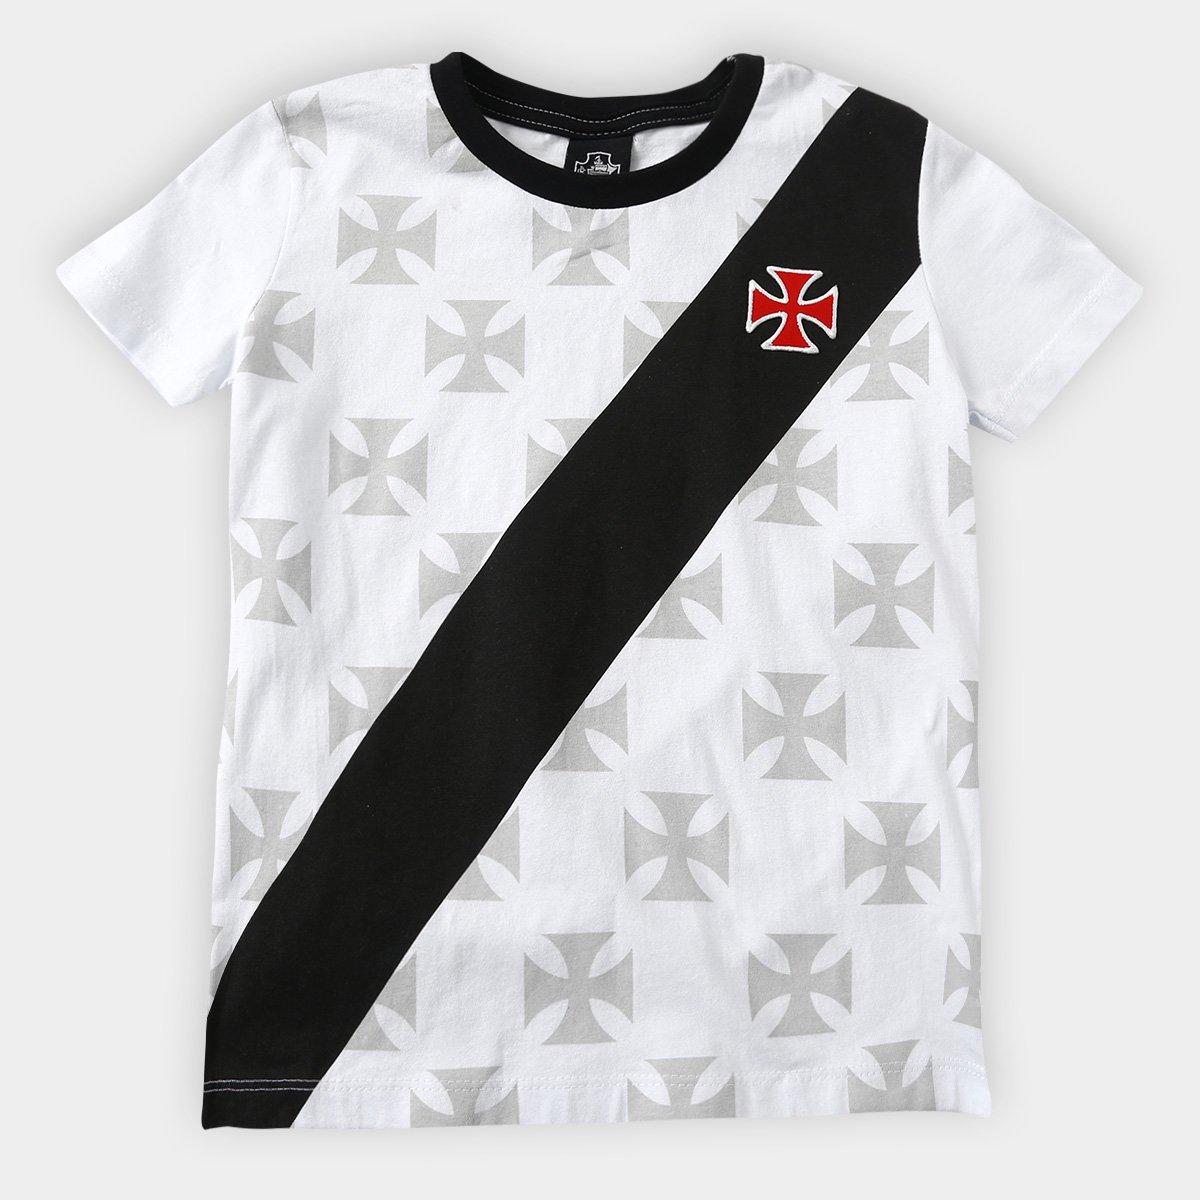 7552b0a2422dd Camiseta Vasco Infantil 1995 - Branco - Compre Agora